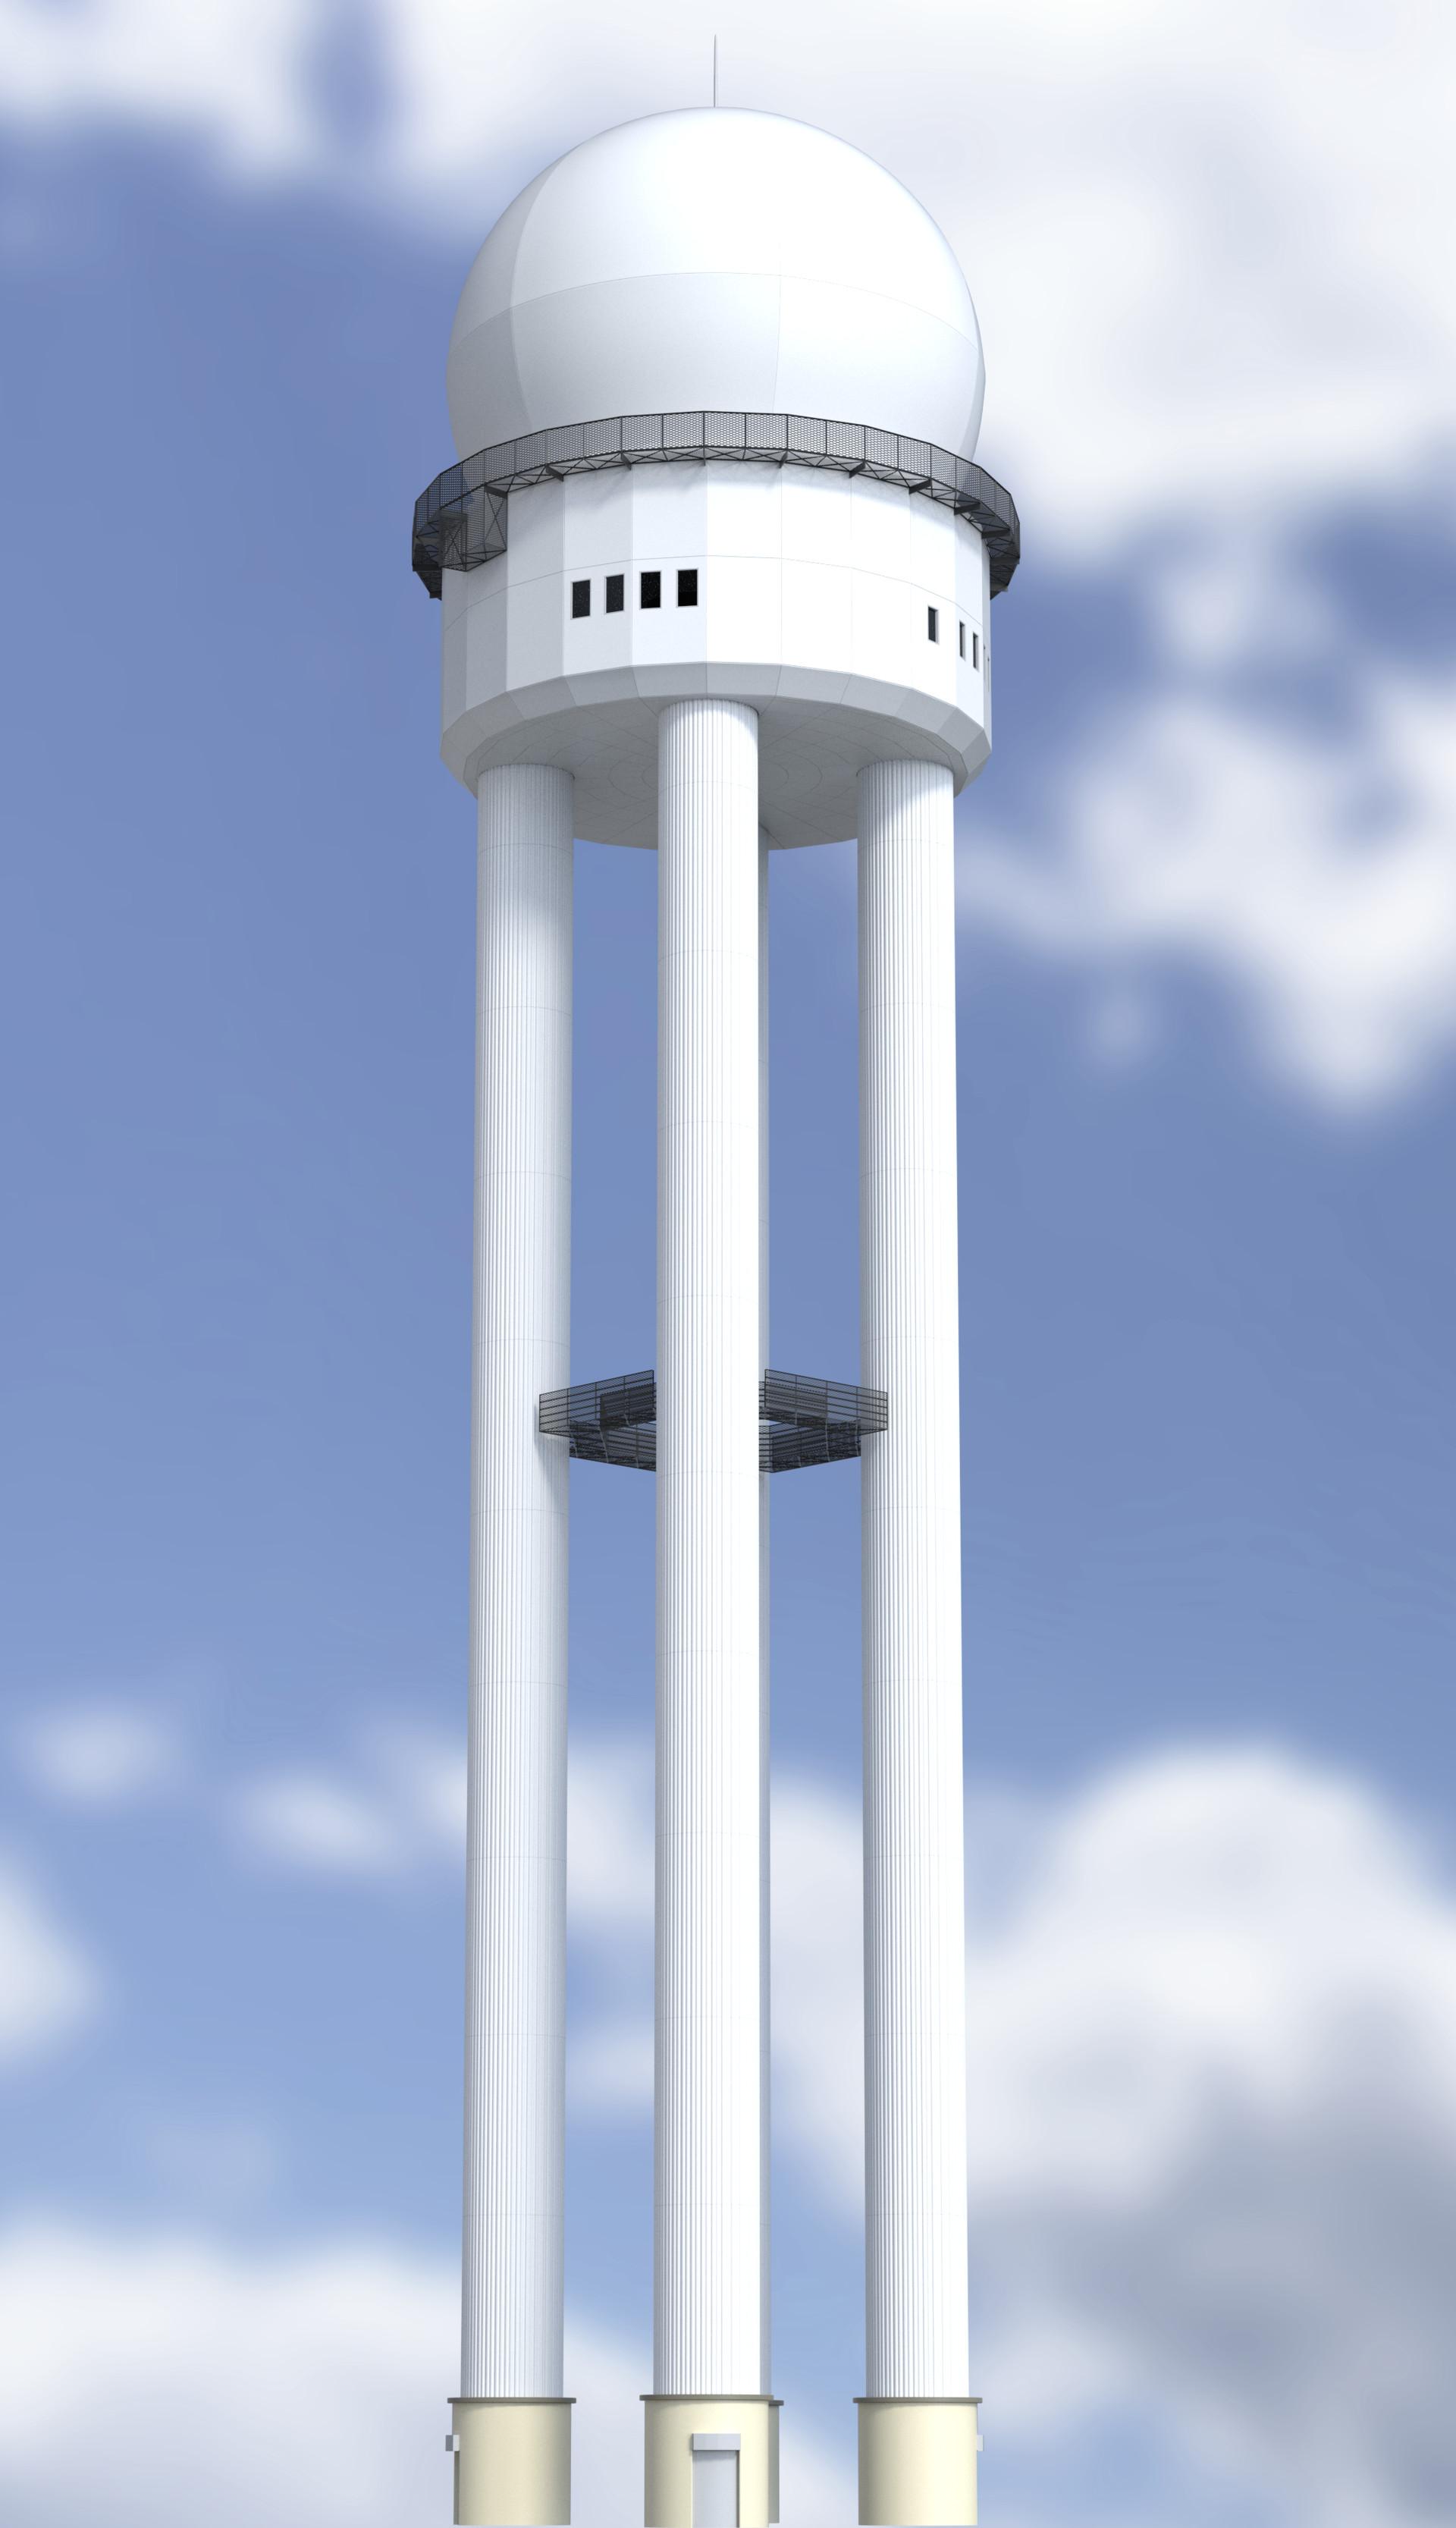 Radarturm 02.